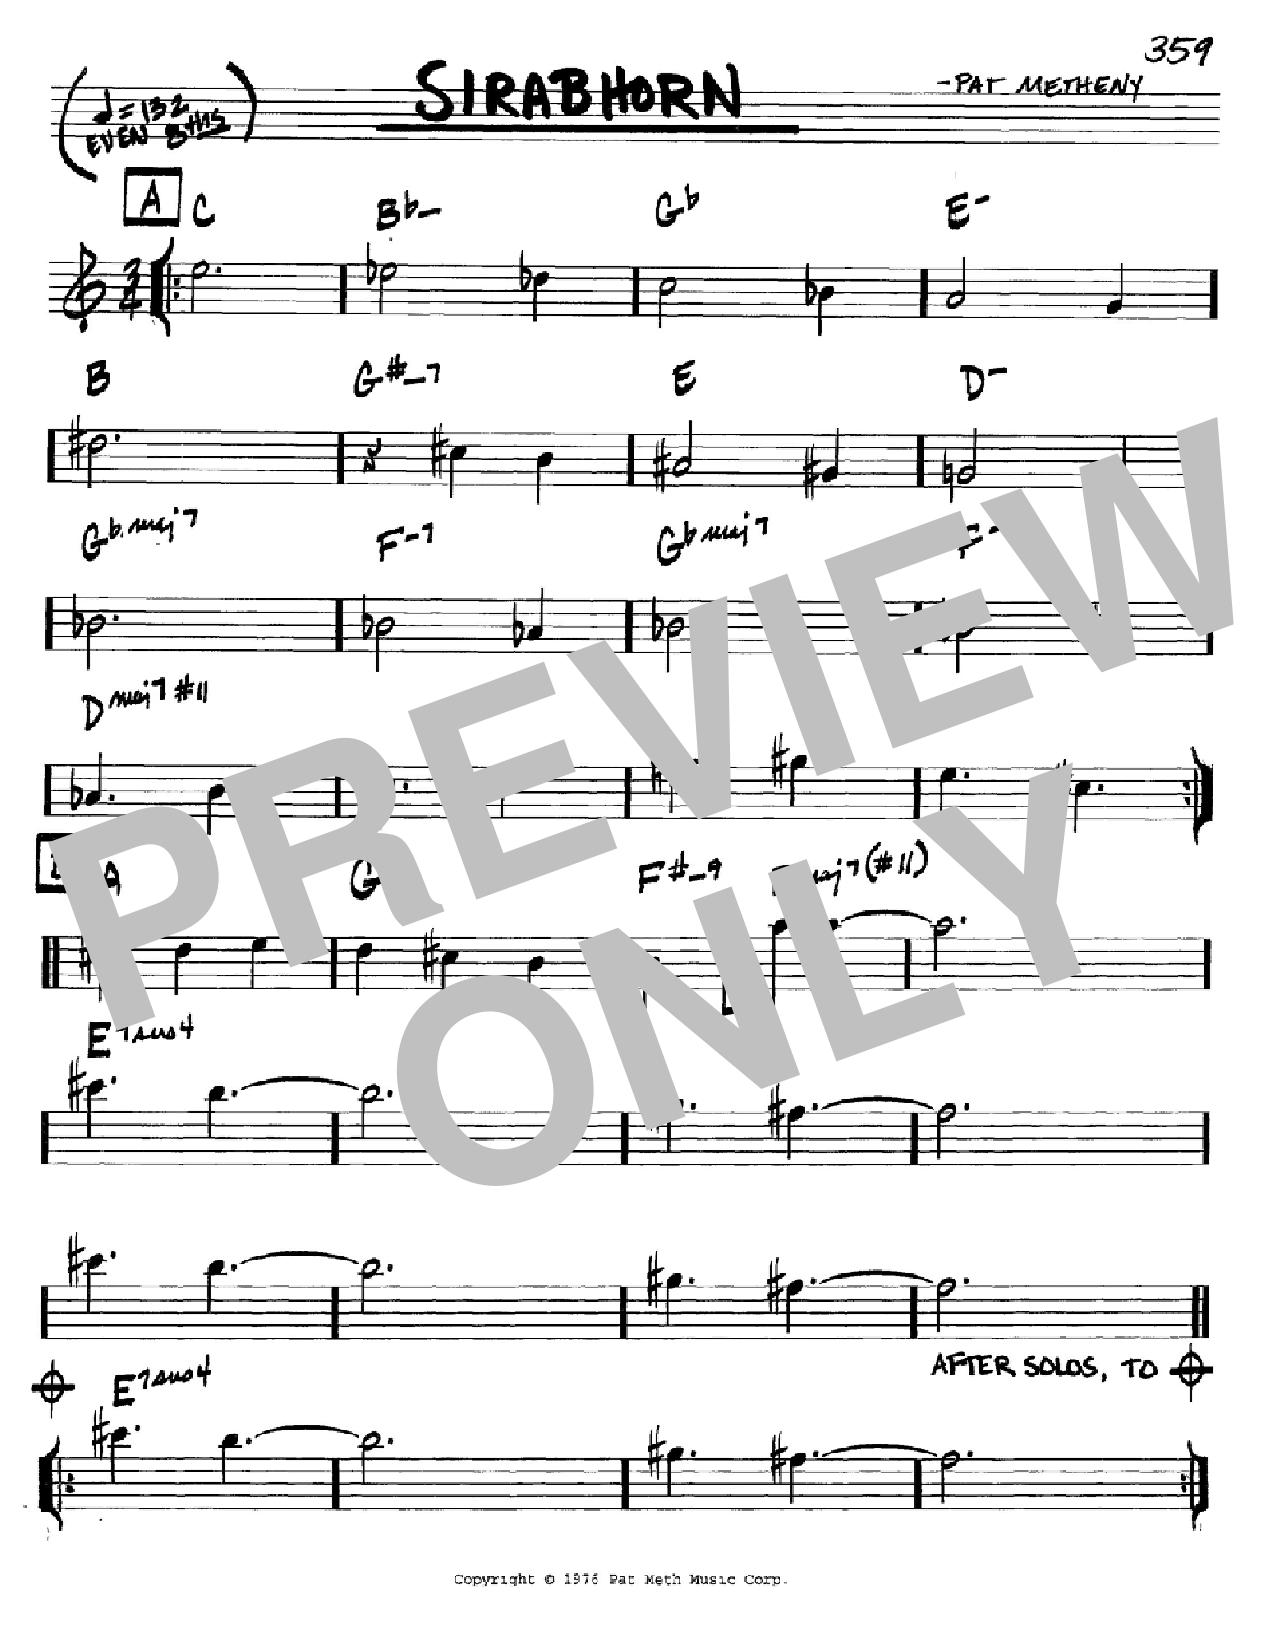 Partition autre Sirabhorn de Pat Metheny - Real Book, Melodie et Accords, Inst. En Do